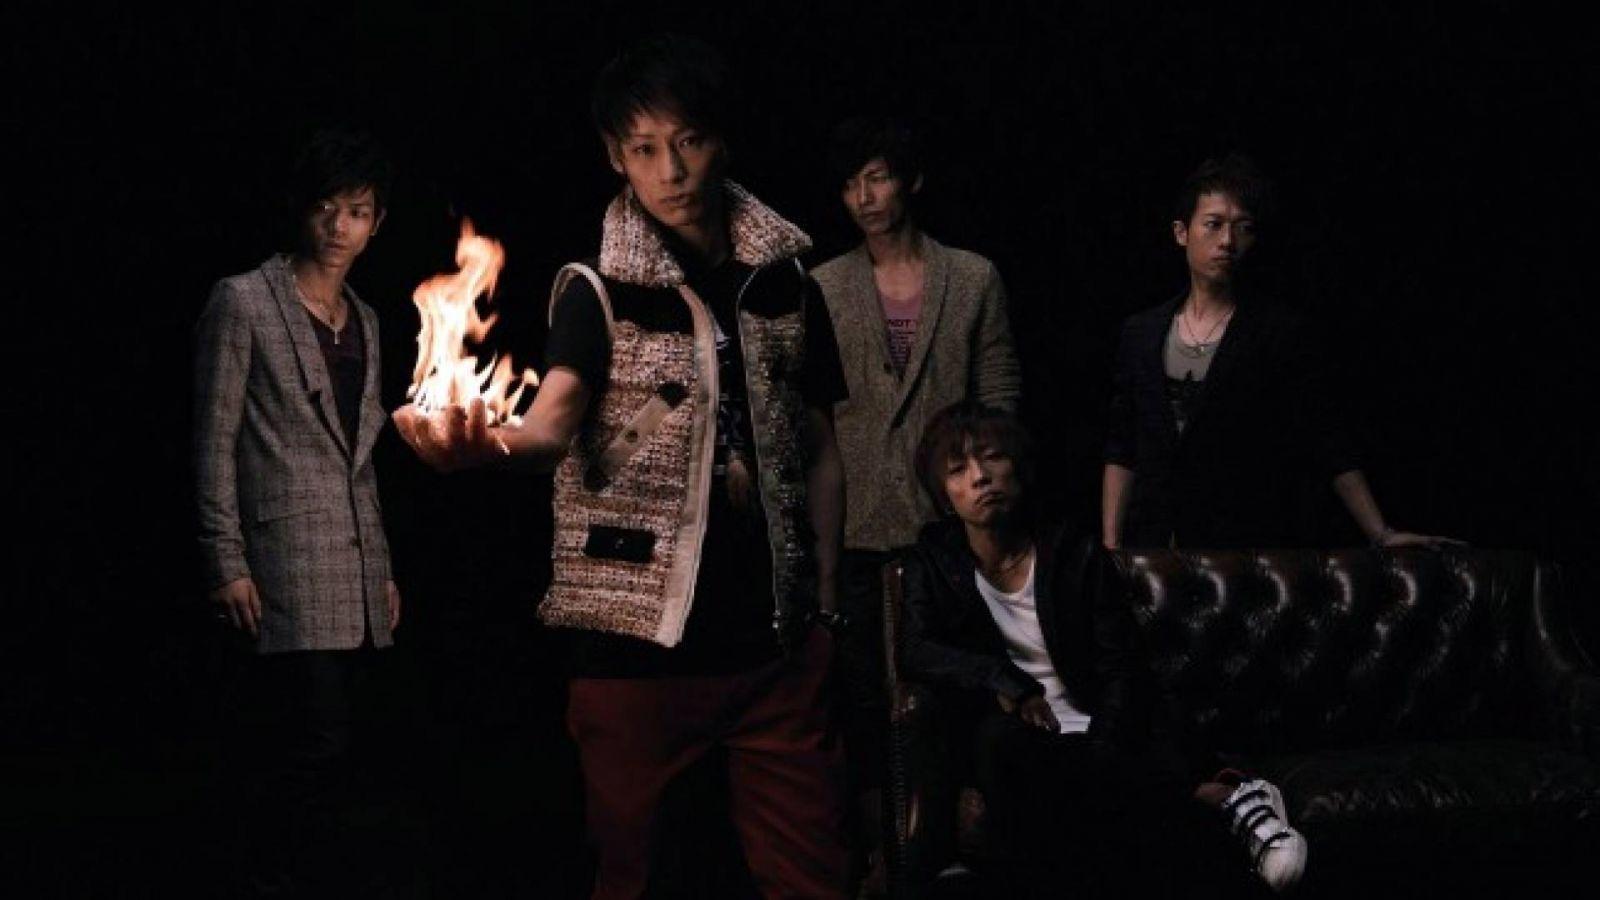 UVERworld © Sony Music Entertainment (Japan) Inc.